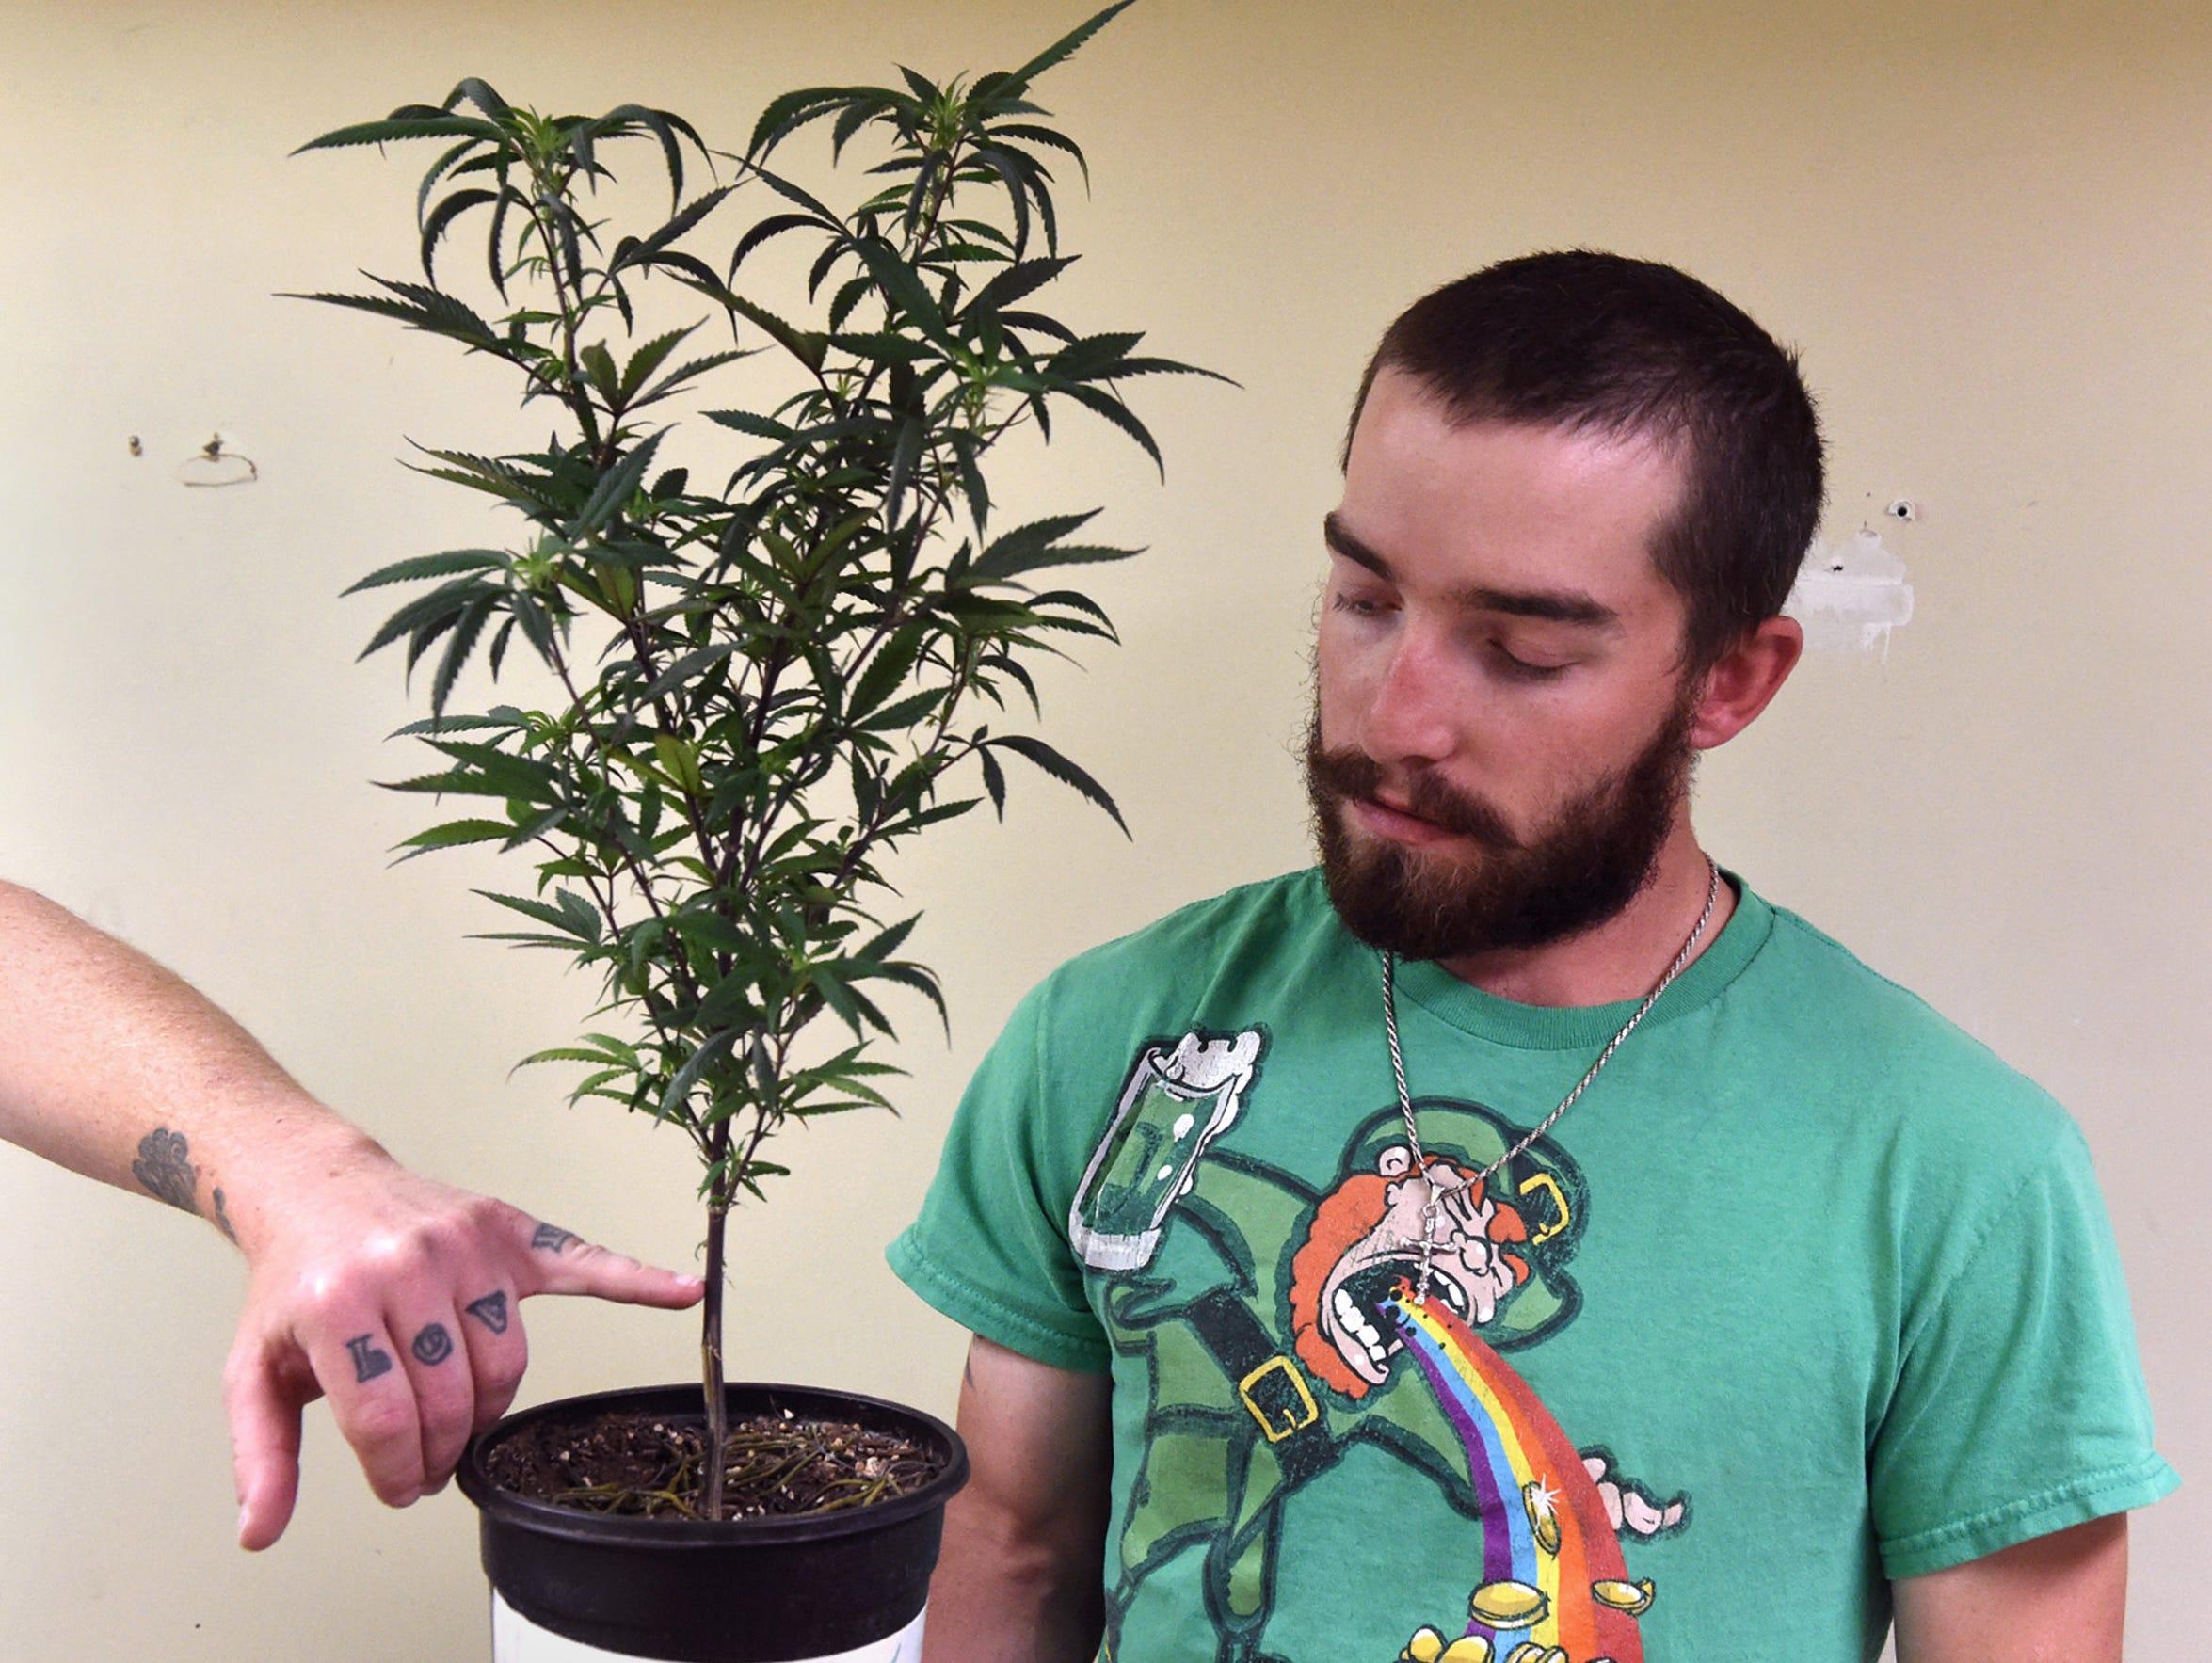 Marcus Conner holds a marijuana plant as roommate Steve